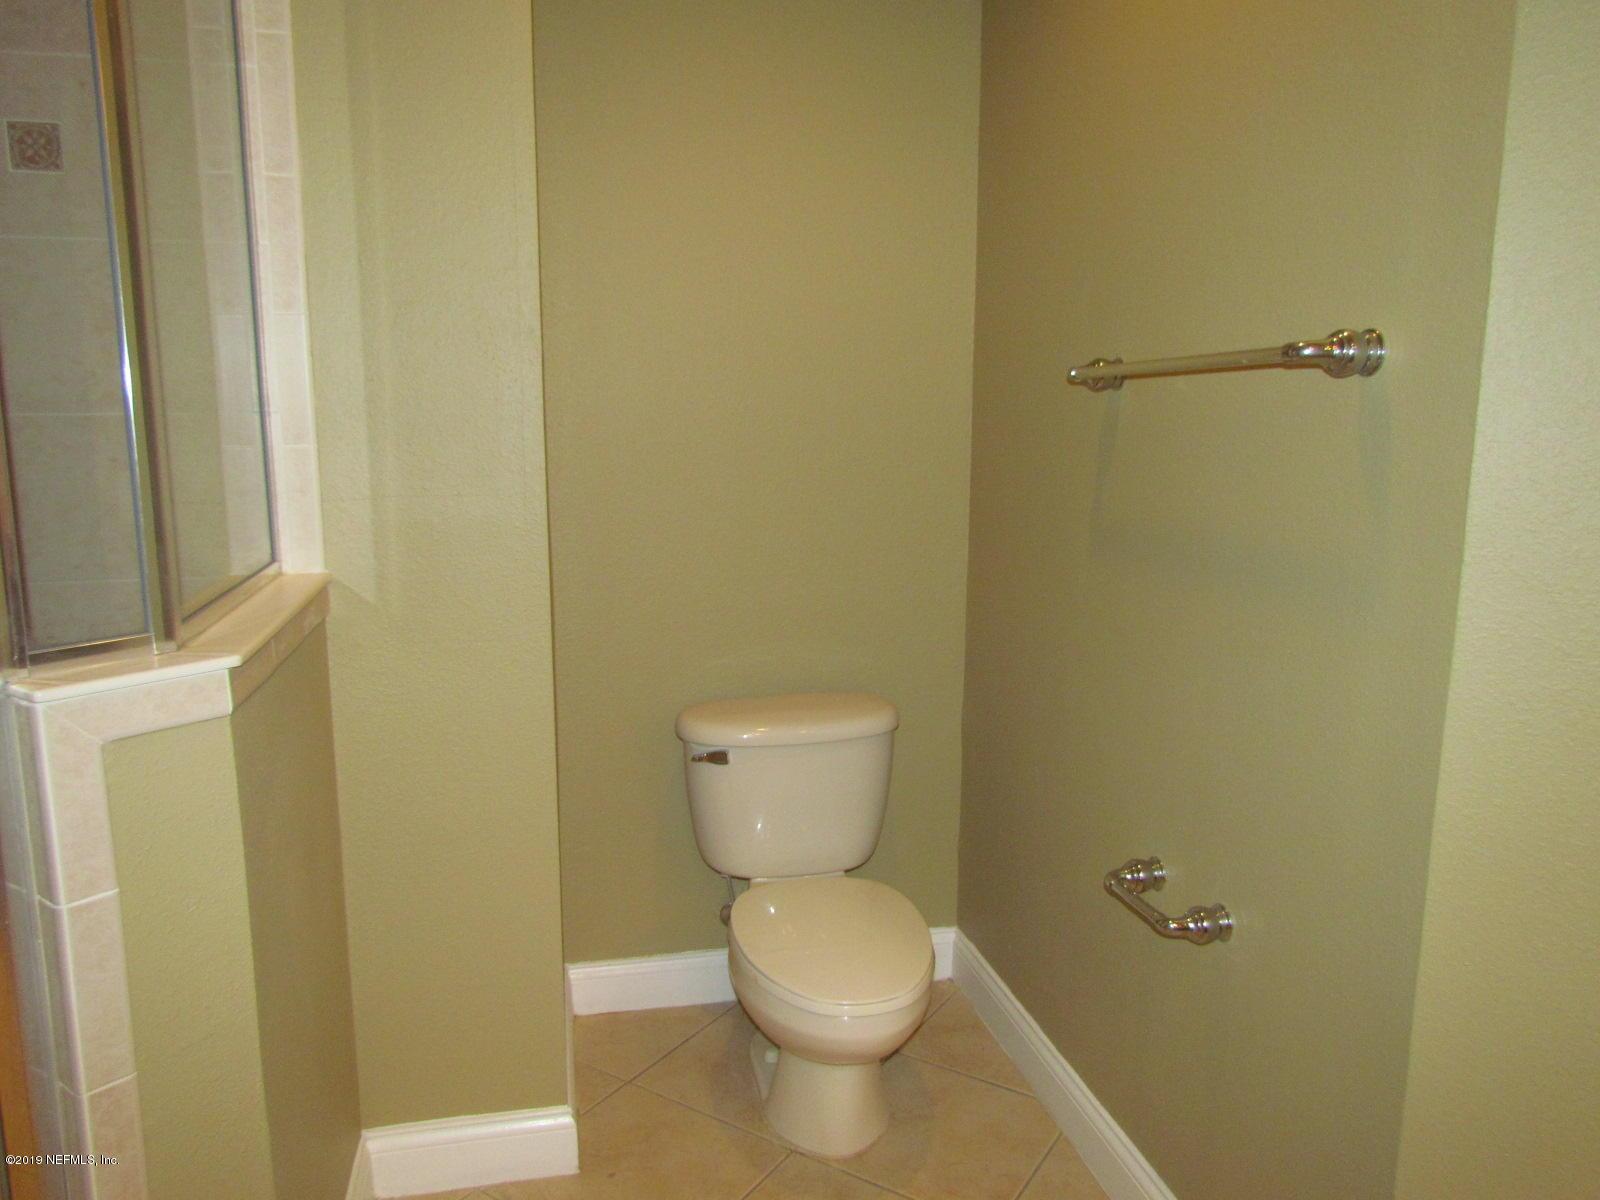 160 HIDDEN PALMS- PONTE VEDRA BEACH- FLORIDA 32082, 3 Bedrooms Bedrooms, ,2 BathroomsBathrooms,Condo,For sale,HIDDEN PALMS,1003149